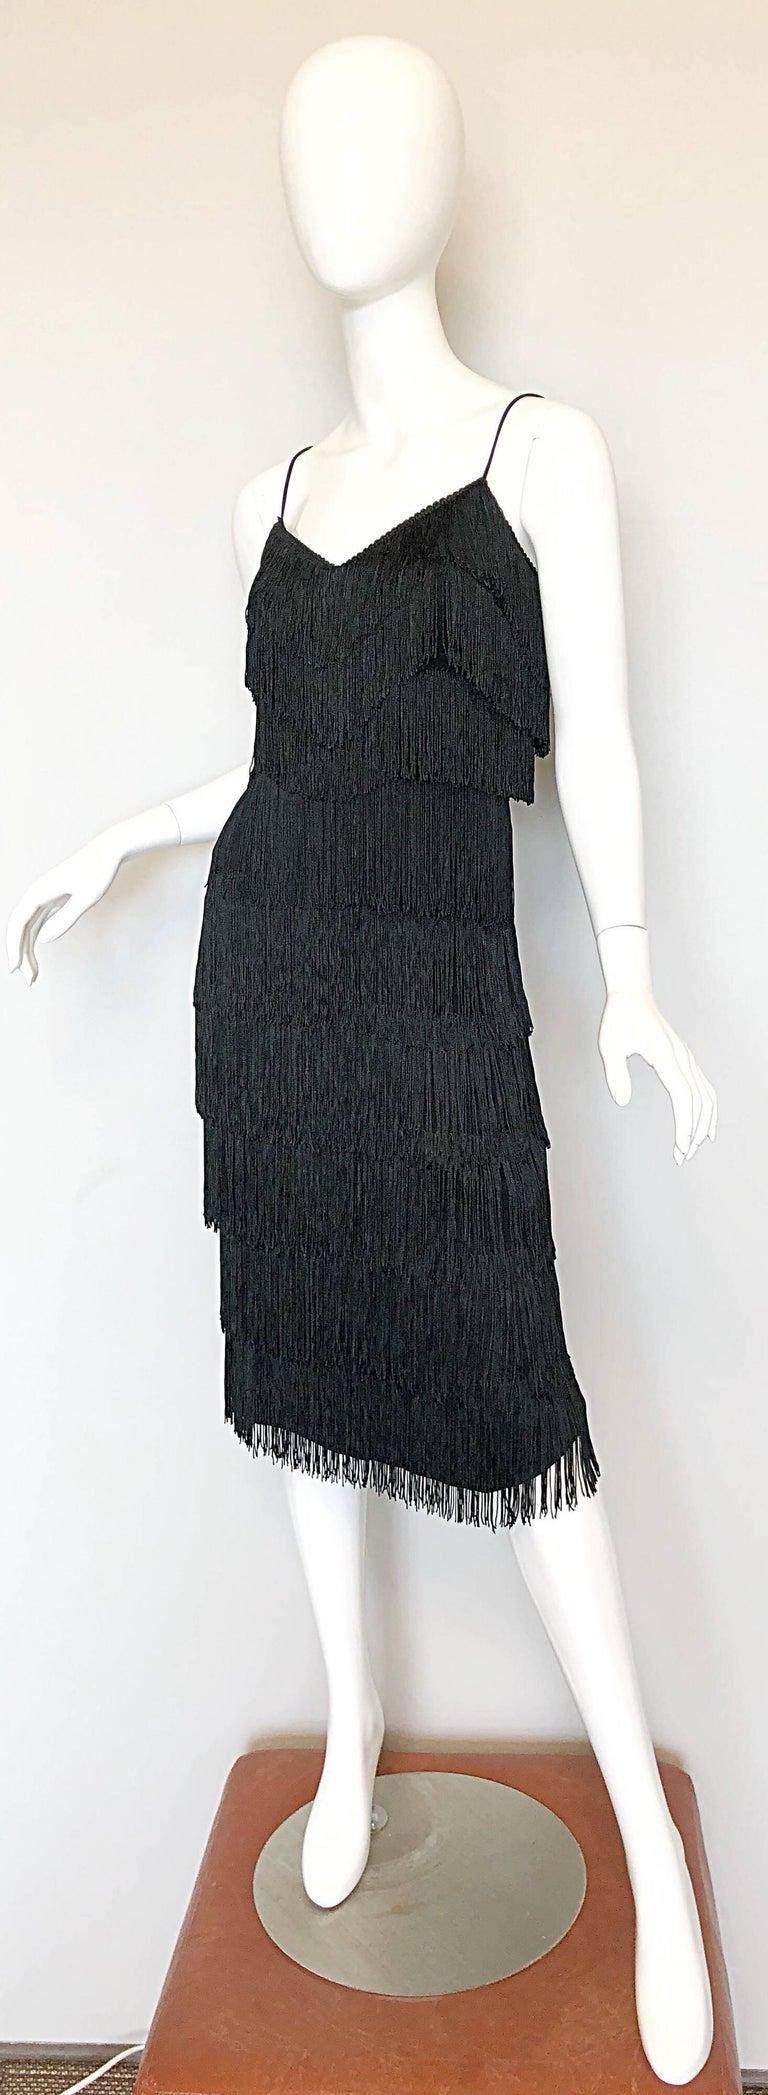 1970s Lilli Diamond Black Fully Fringed Vintage Flapper Style 70s Cocktail Dress For Sale 1